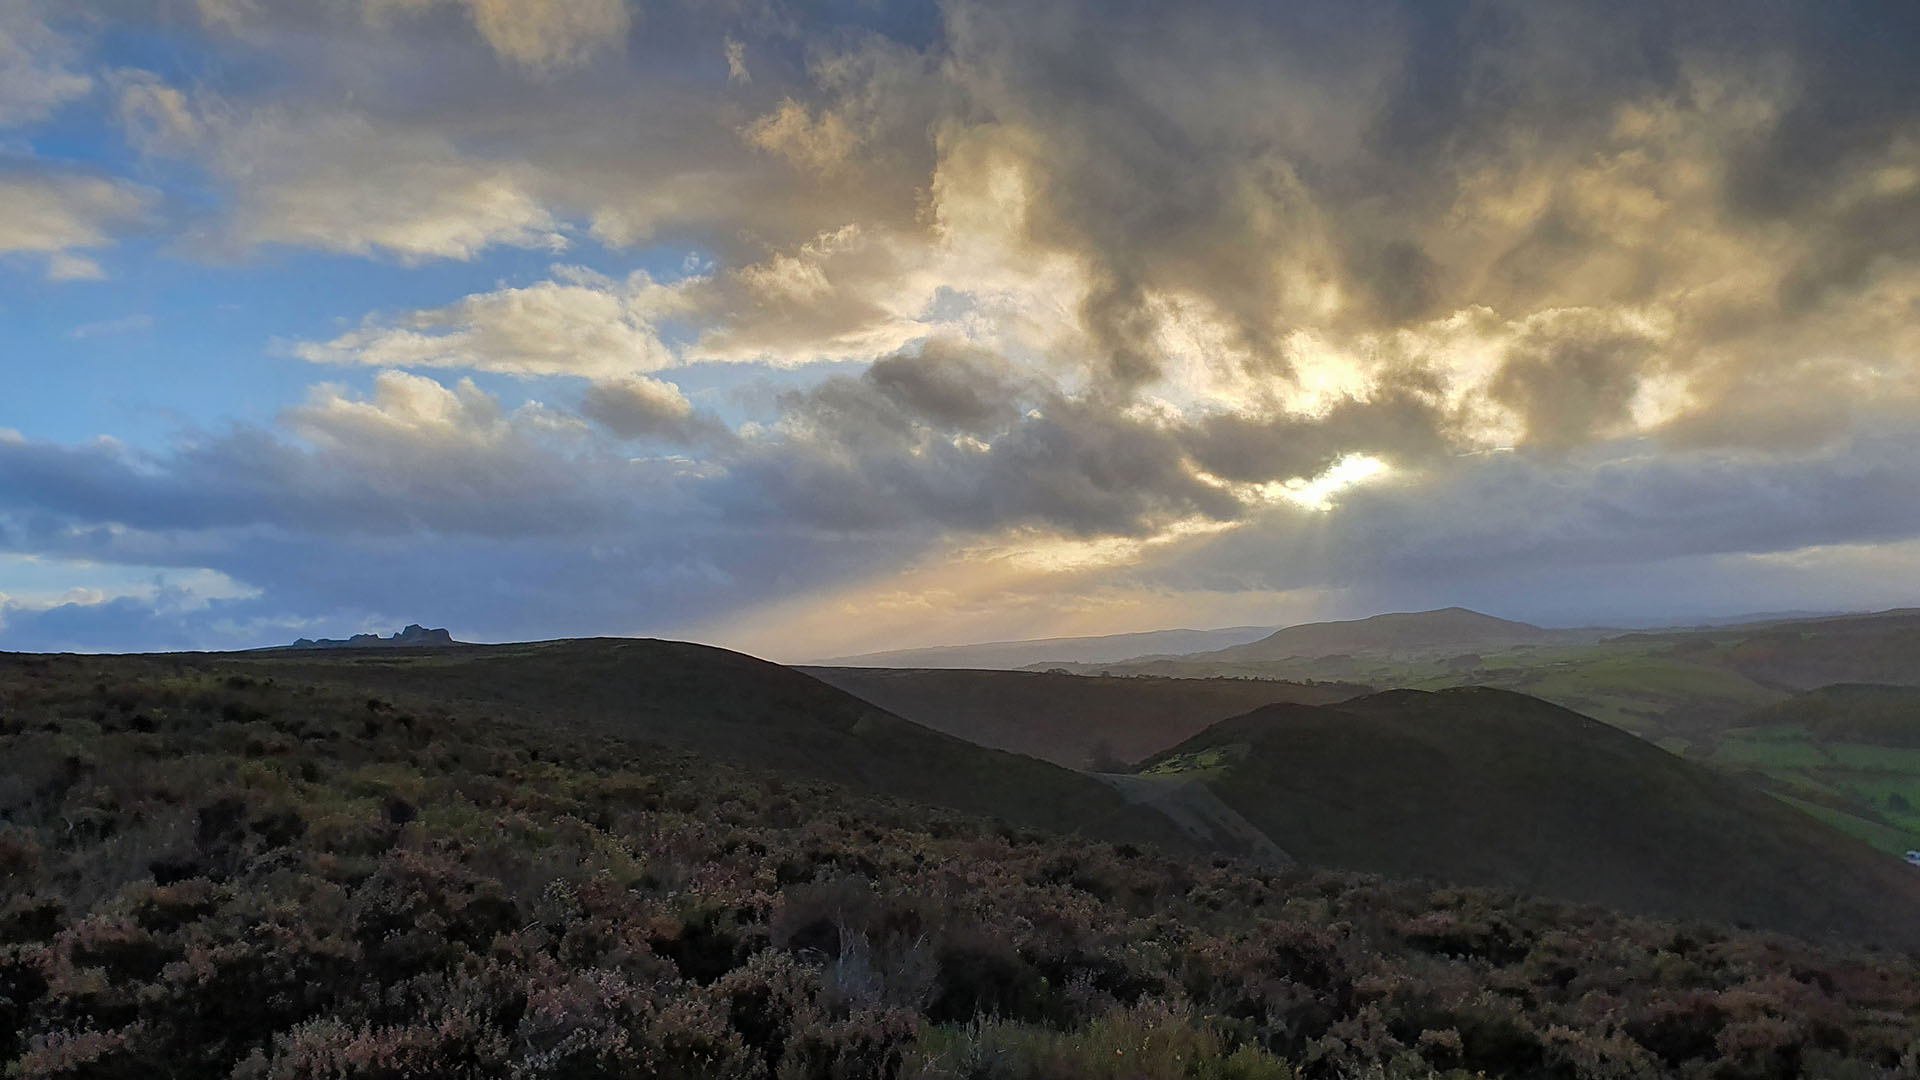 View from near Shepherd's Rock westwards towards the Welsh mountains